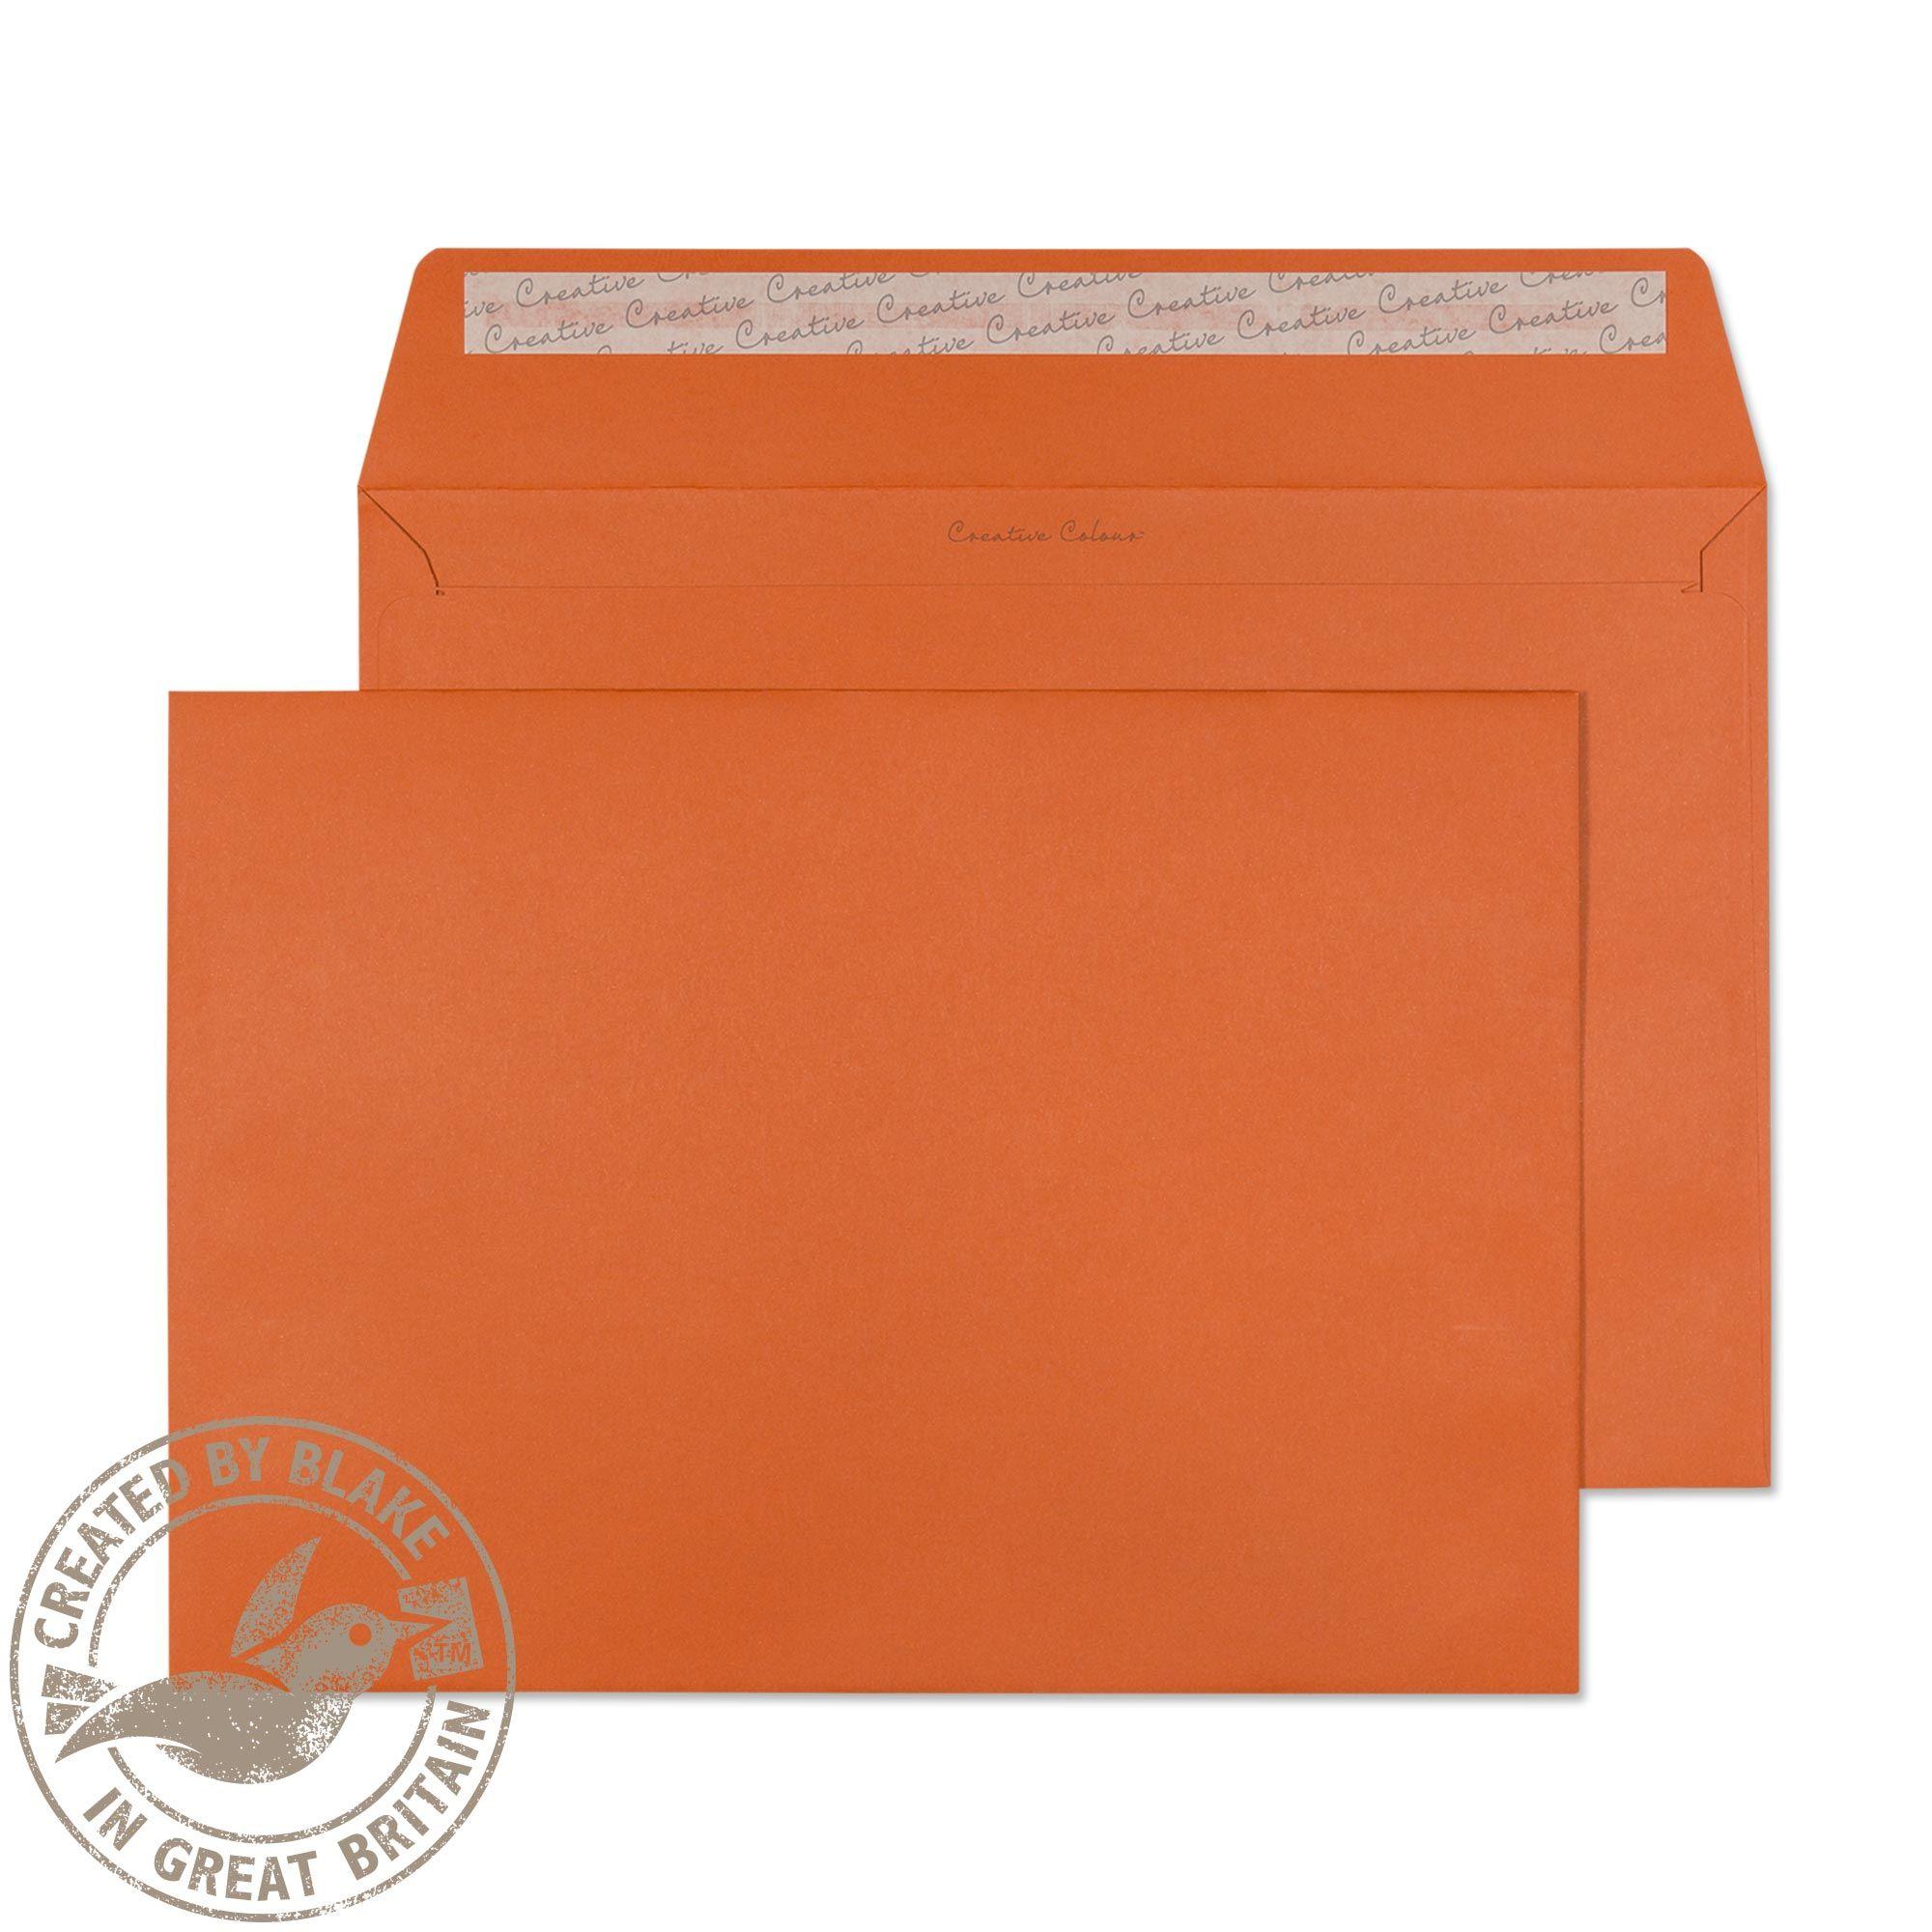 )Creat Col Marma Orange P&S Wlt C4 Pk250